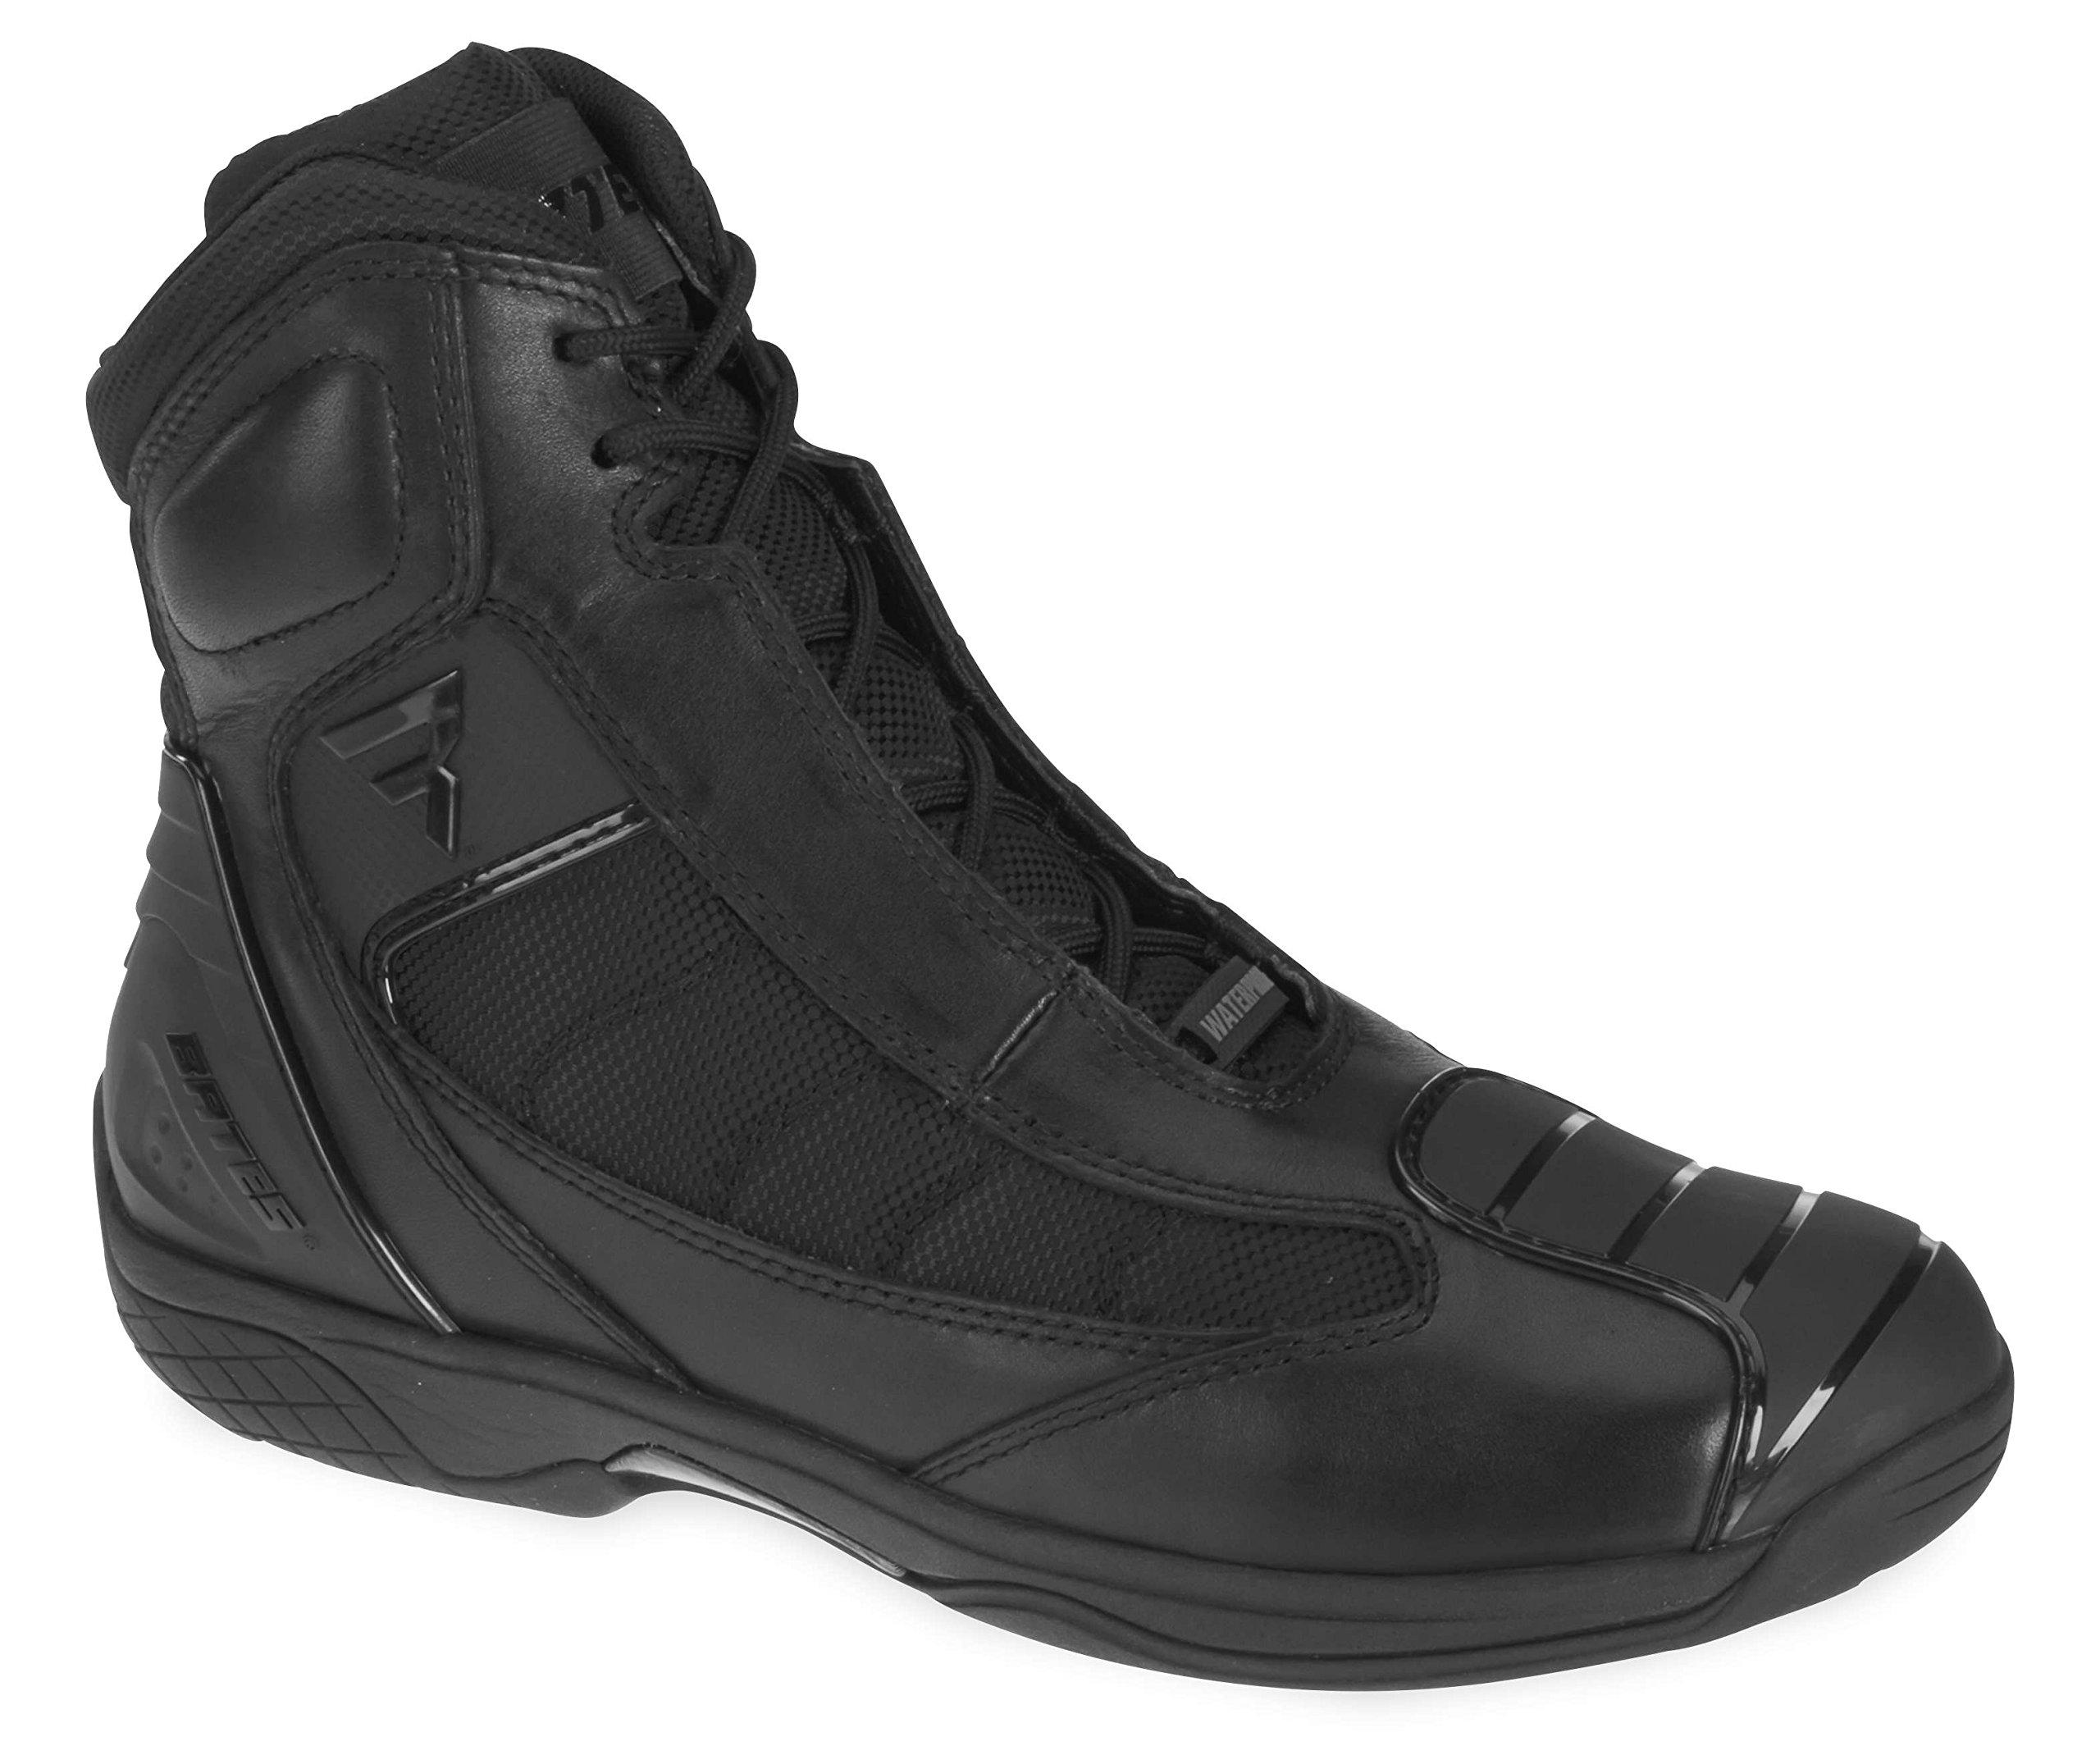 Bates Beltline Performance Men's Motorcycle Boots (Black, Size 11.5)